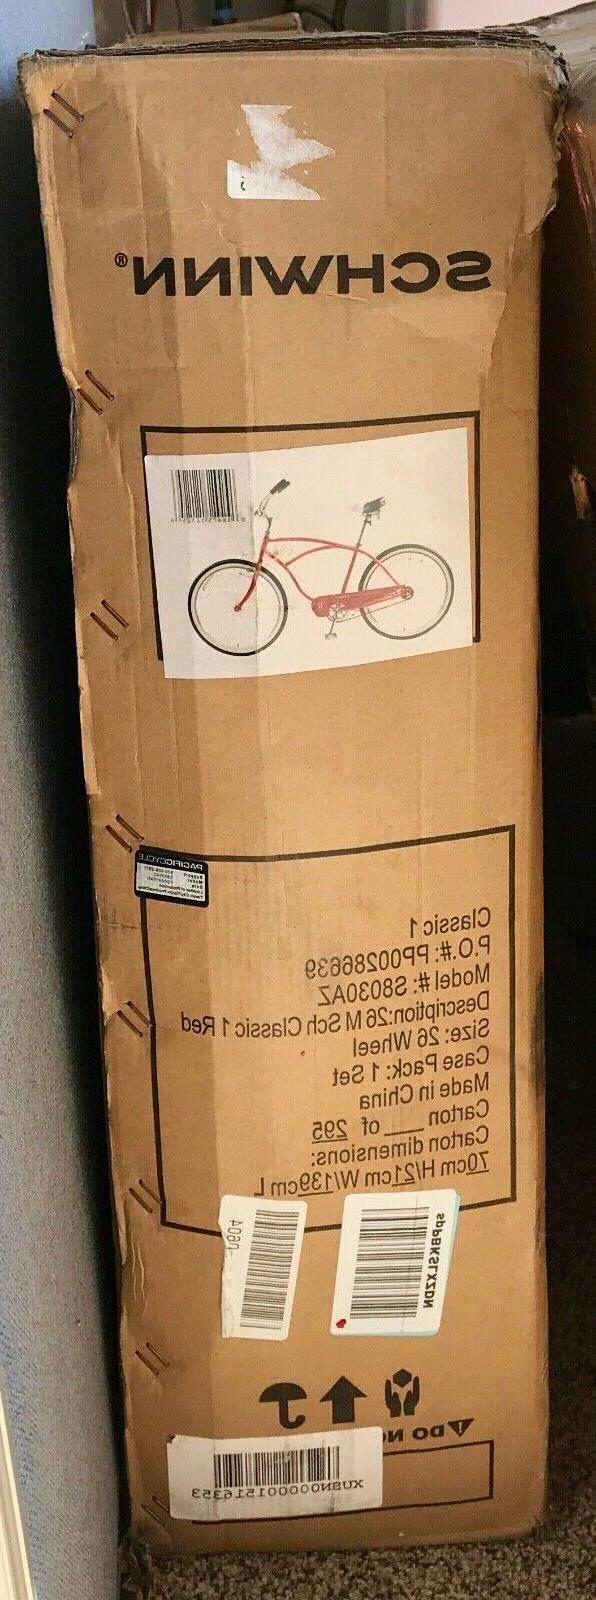 "NEW IN Men's Classic 1 Wheel Cruiser Bicycle, Red, 14""/Medium"